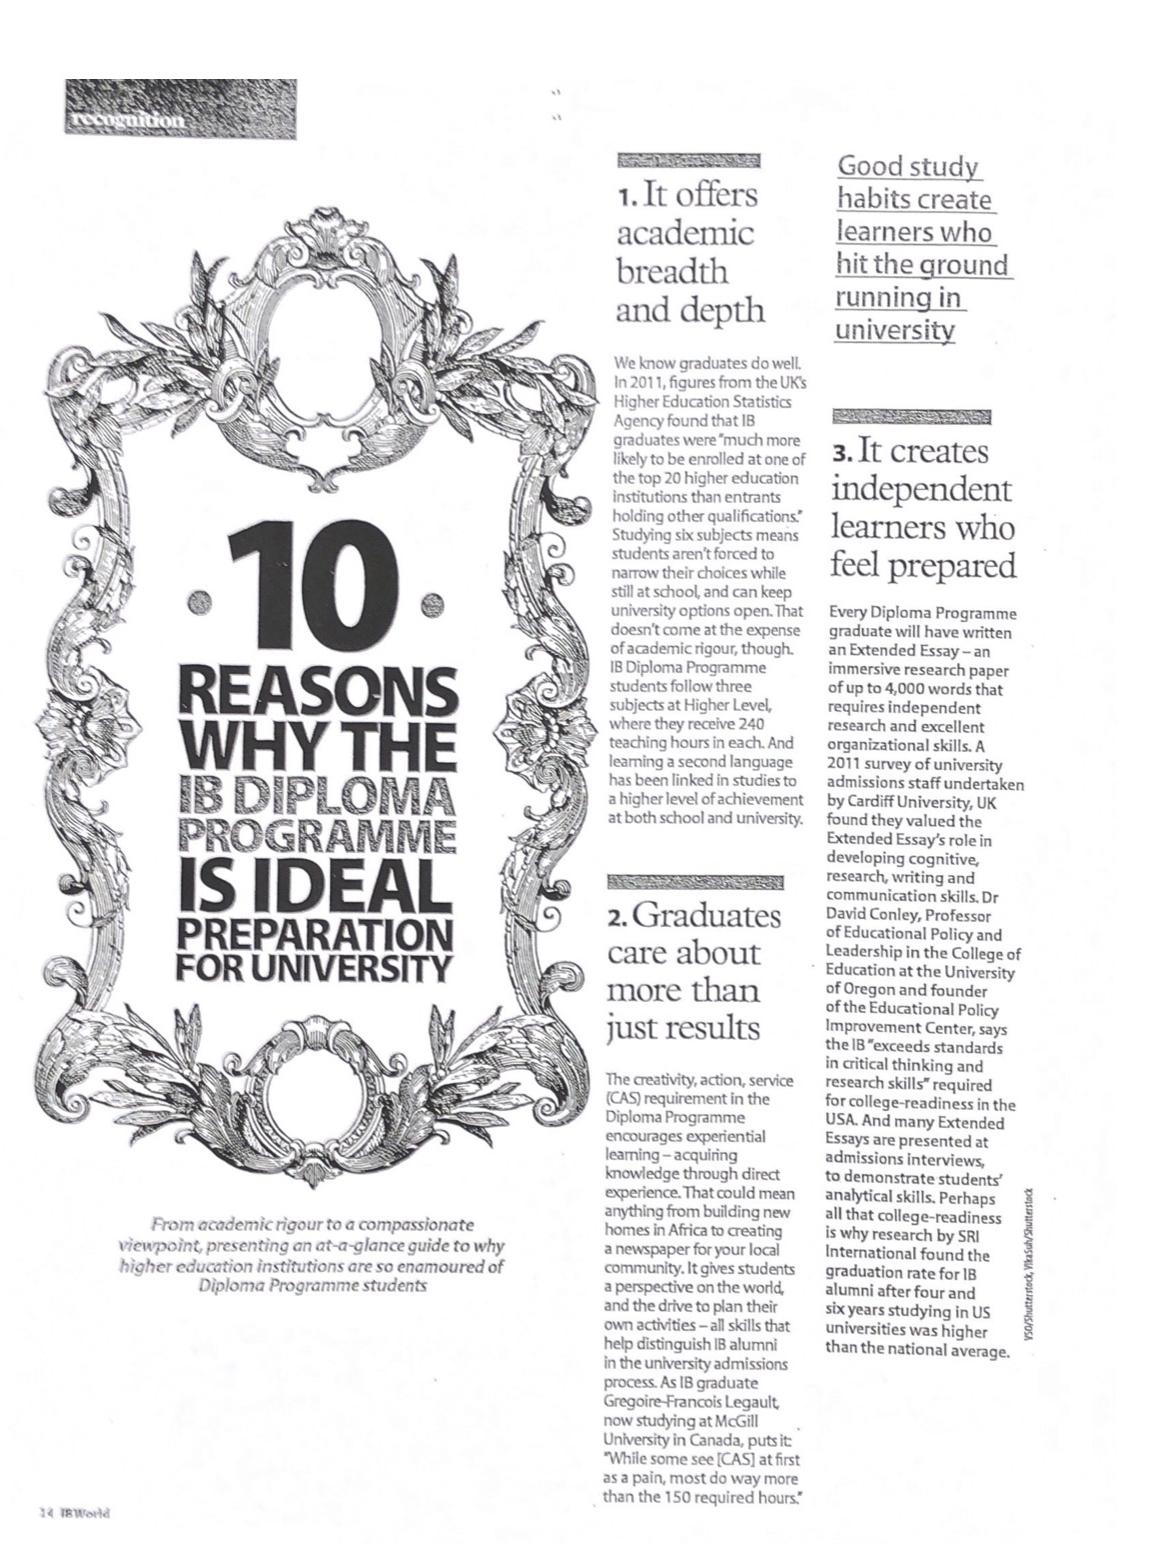 10 Reasons Why IB Diploma Program.jpg